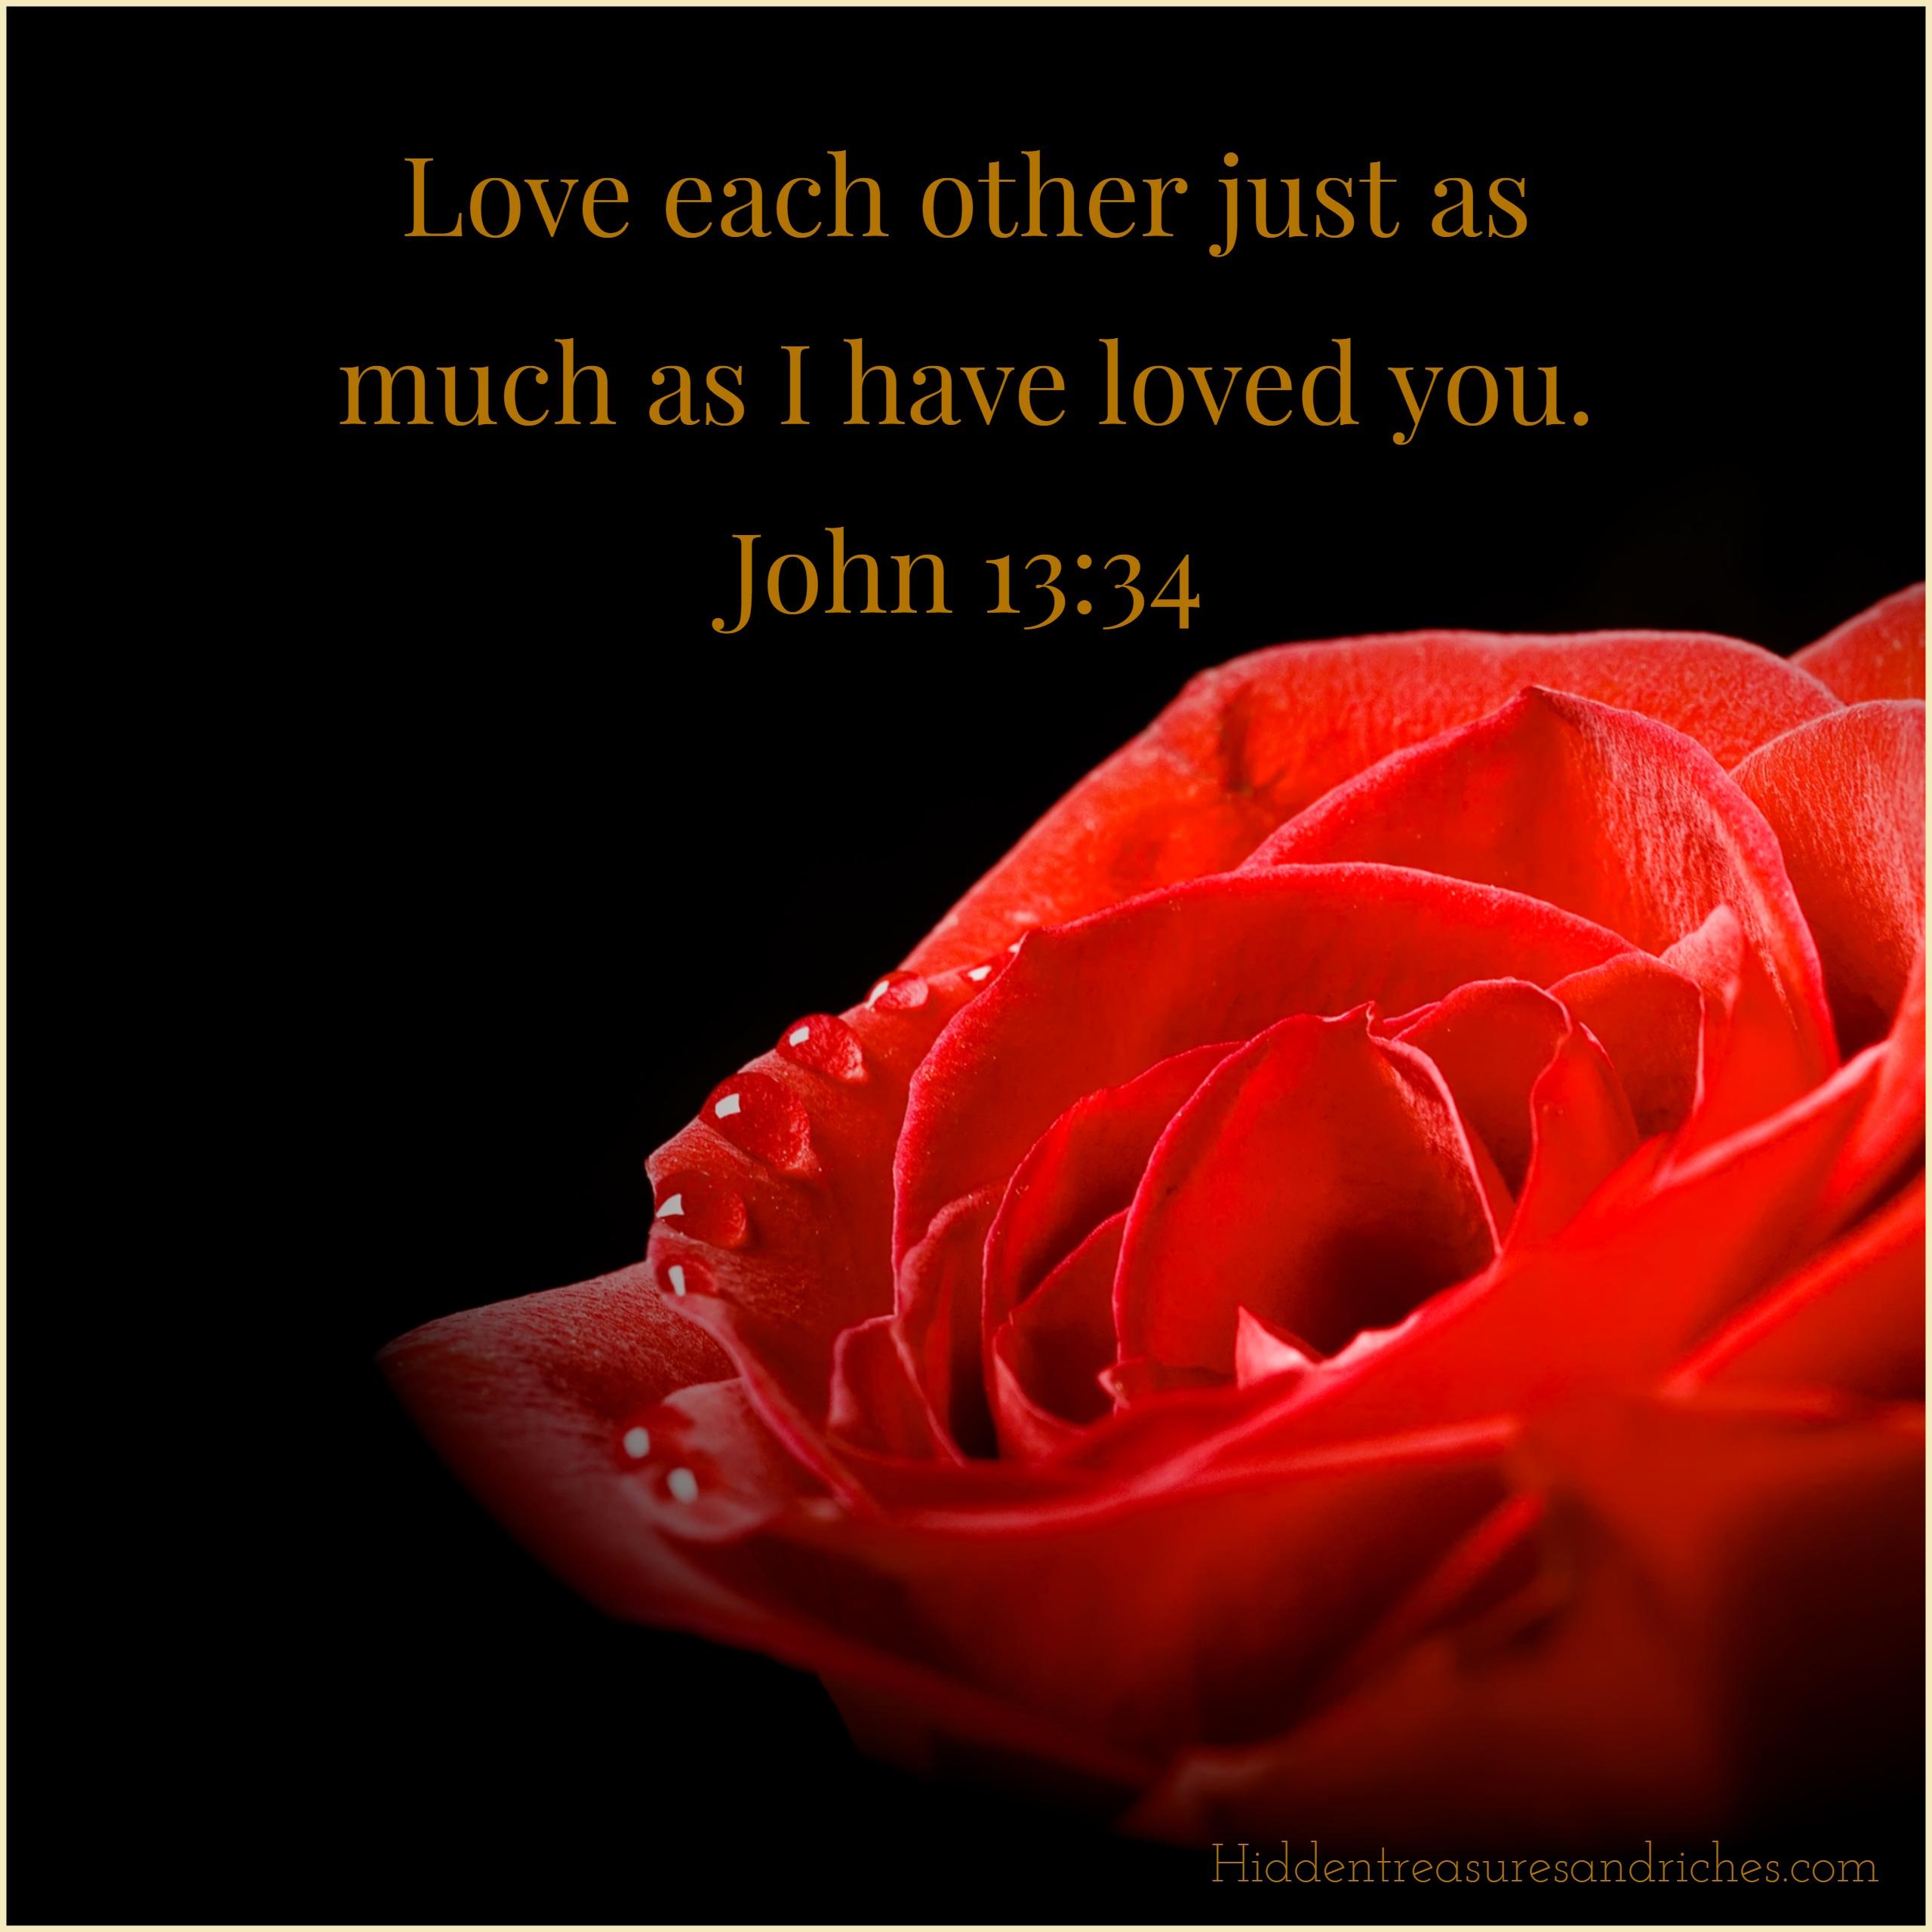 Deep lasting Love